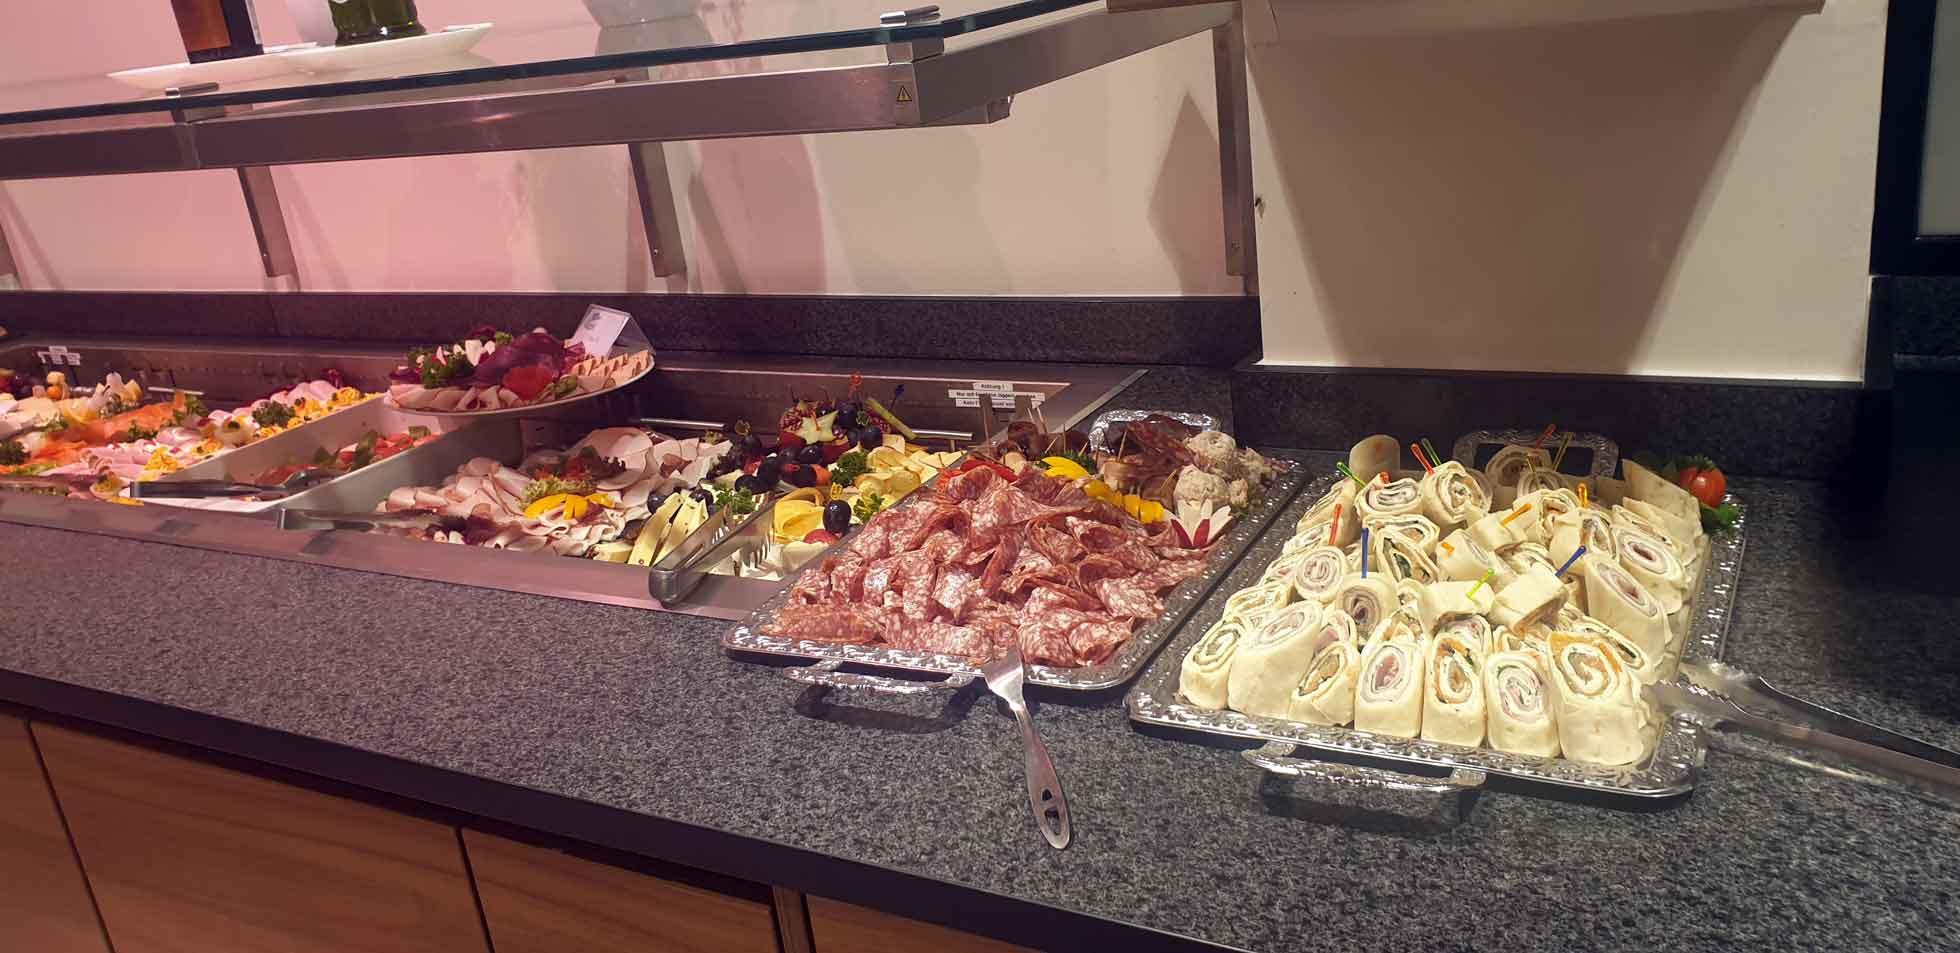 Krainer_Buffet_Catering_01.jpg